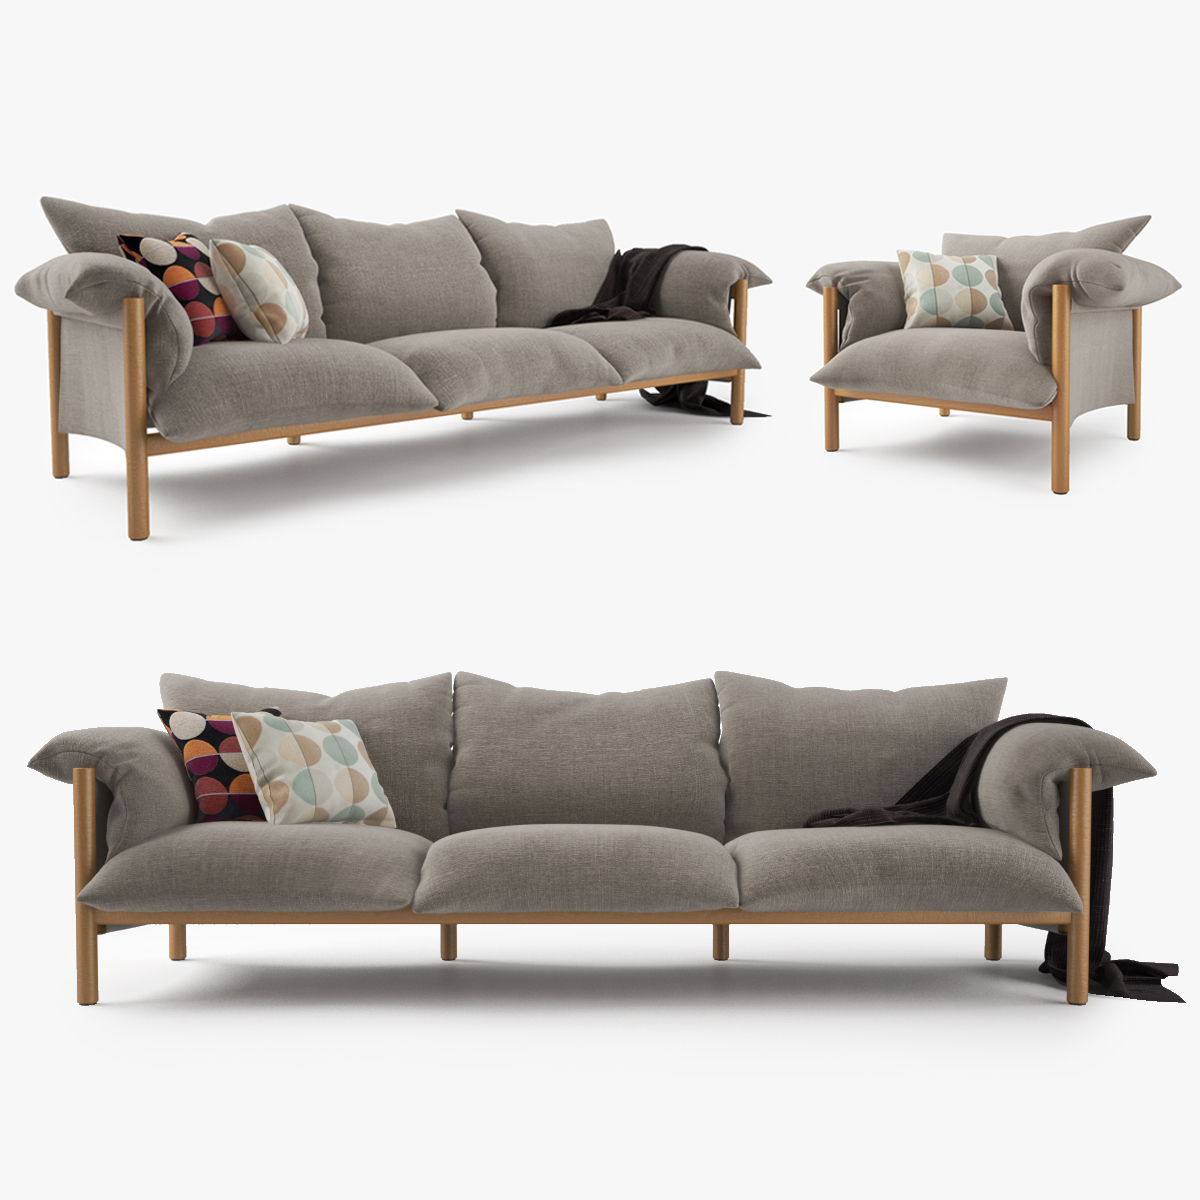 Stupendous Jardan Wilfred Sofa Chair Set Inzonedesignstudio Interior Chair Design Inzonedesignstudiocom